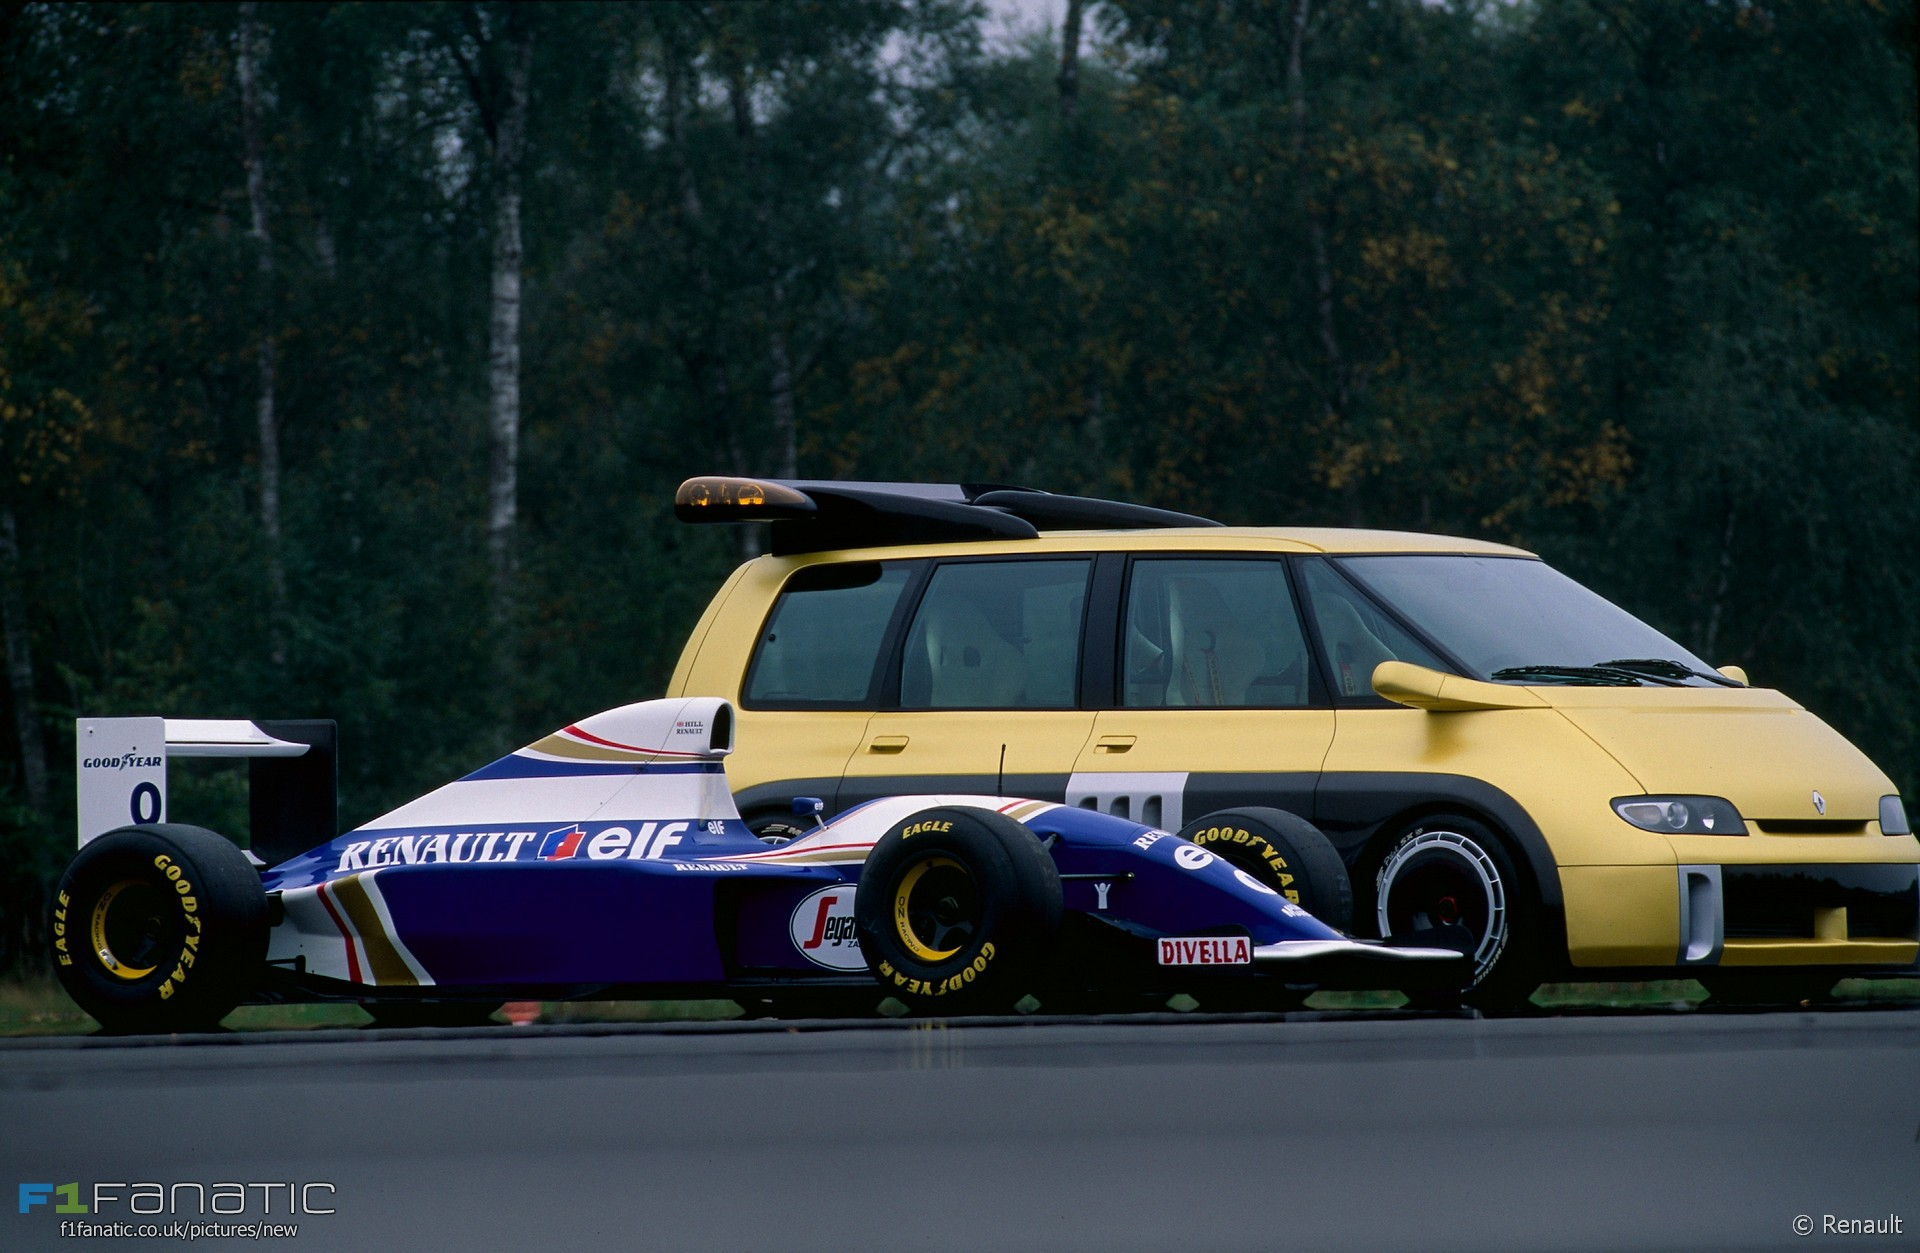 williams fw16 renault espace f1 1994 racefans. Black Bedroom Furniture Sets. Home Design Ideas